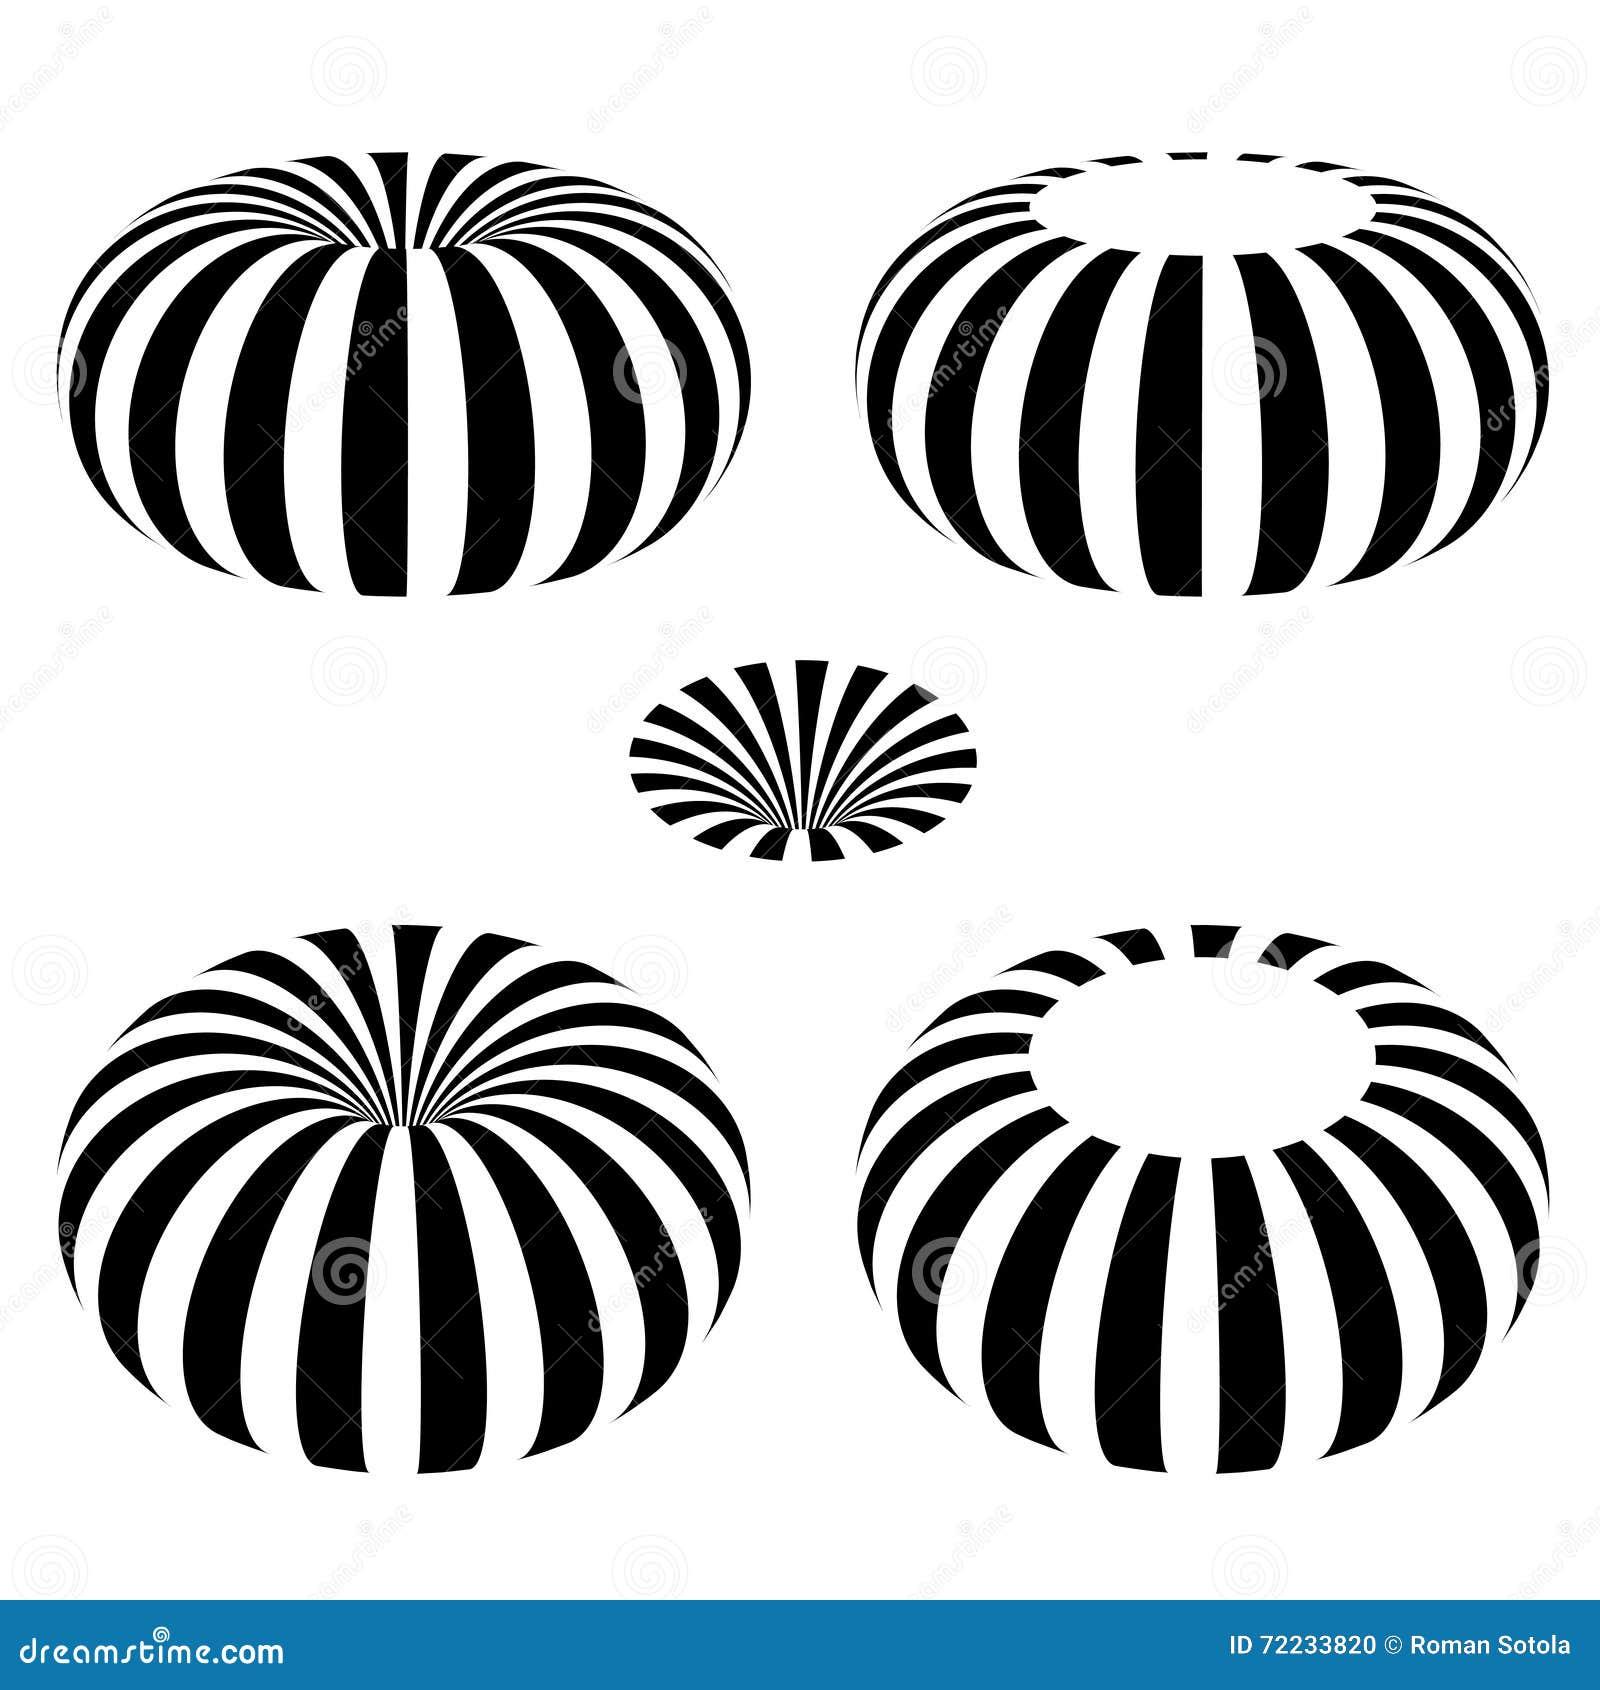 Magnetic Field Toroid Black Symbol Stock Vector Illustration Of